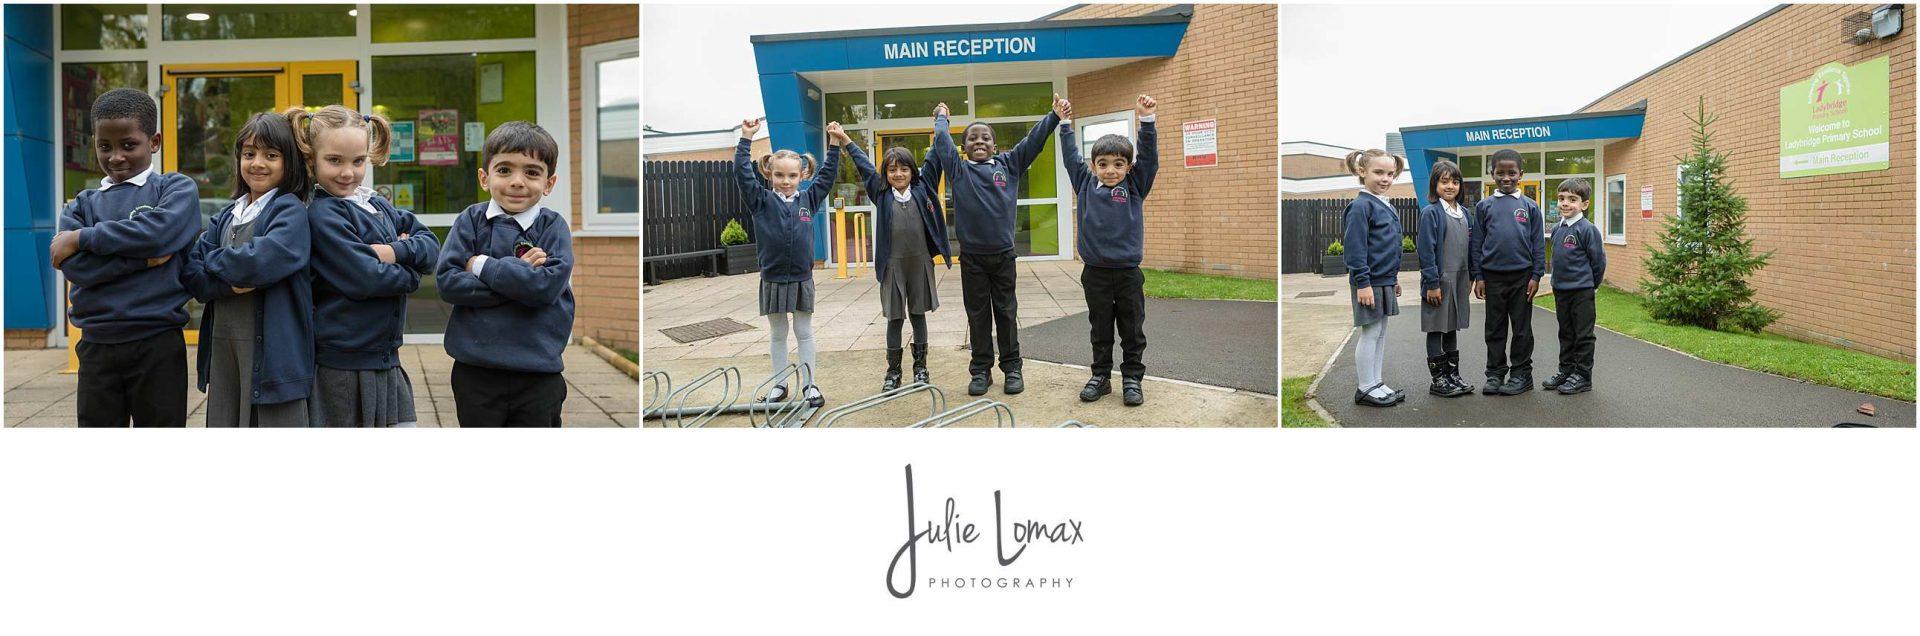 Schools Photographer, Primary School Documentary Photographer, Documentary Photography, People Photographer, capturing the moment Photography